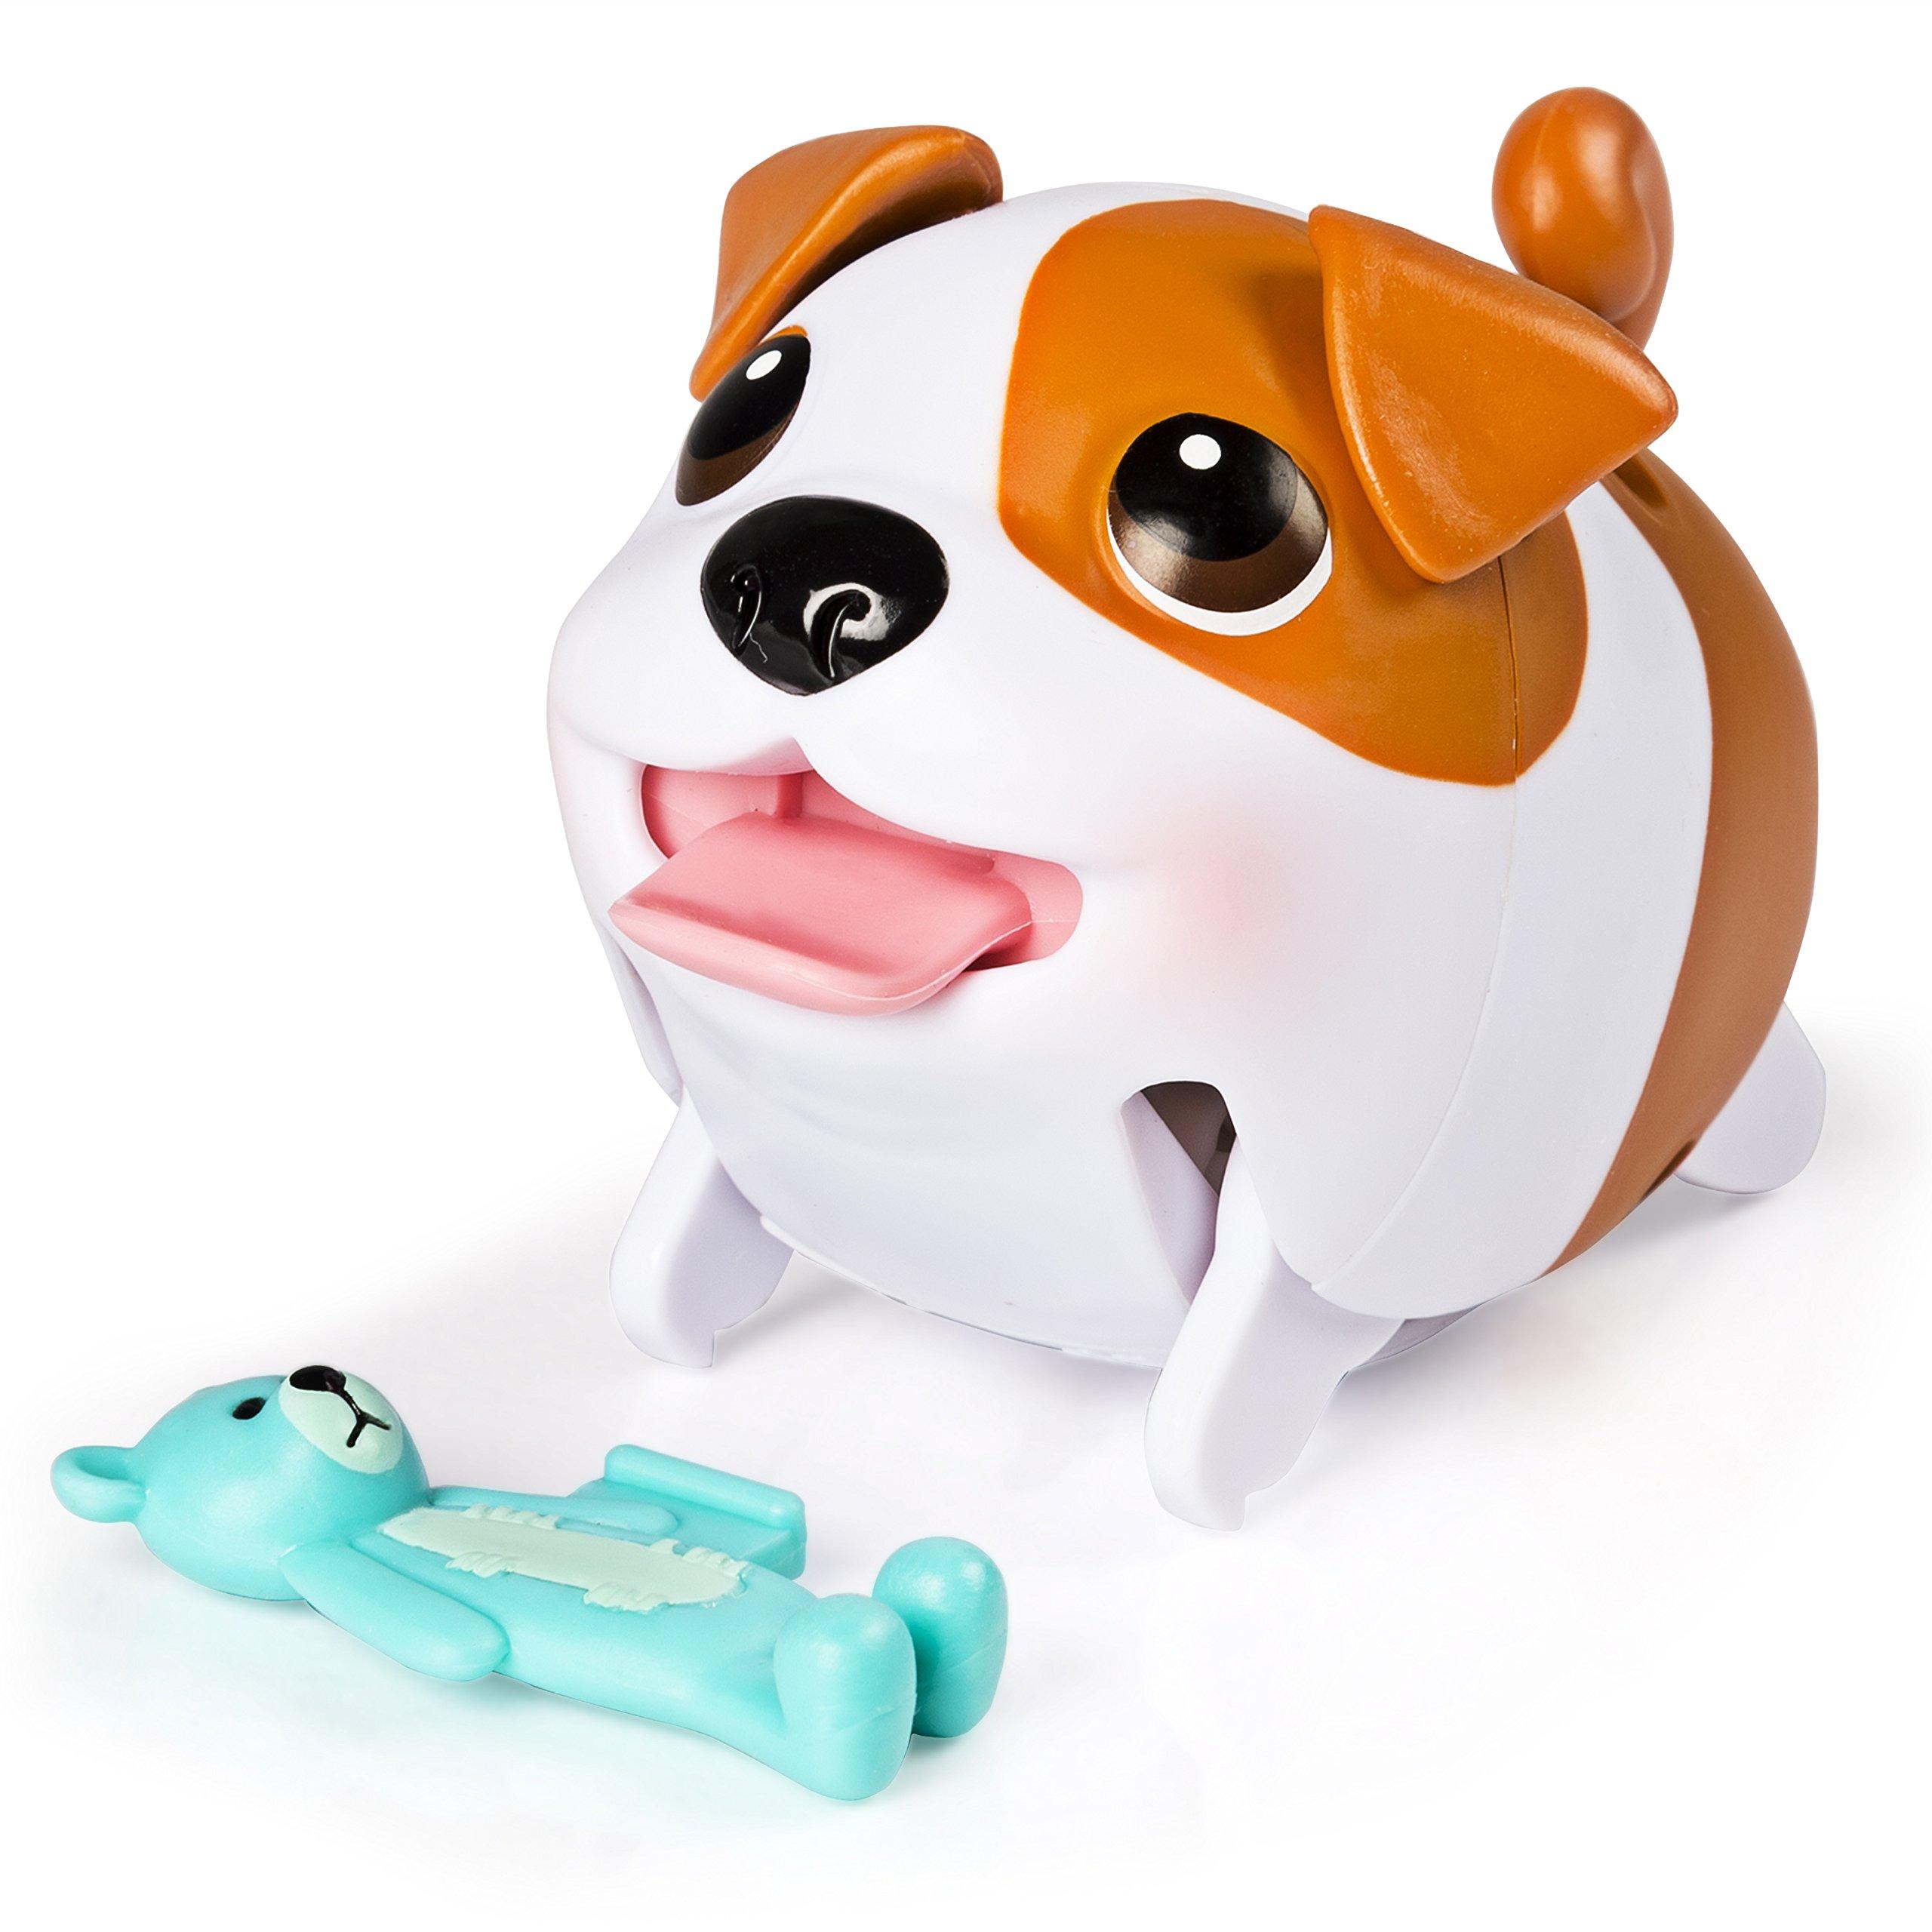 Chubby Puppies Single Pack Bulldog